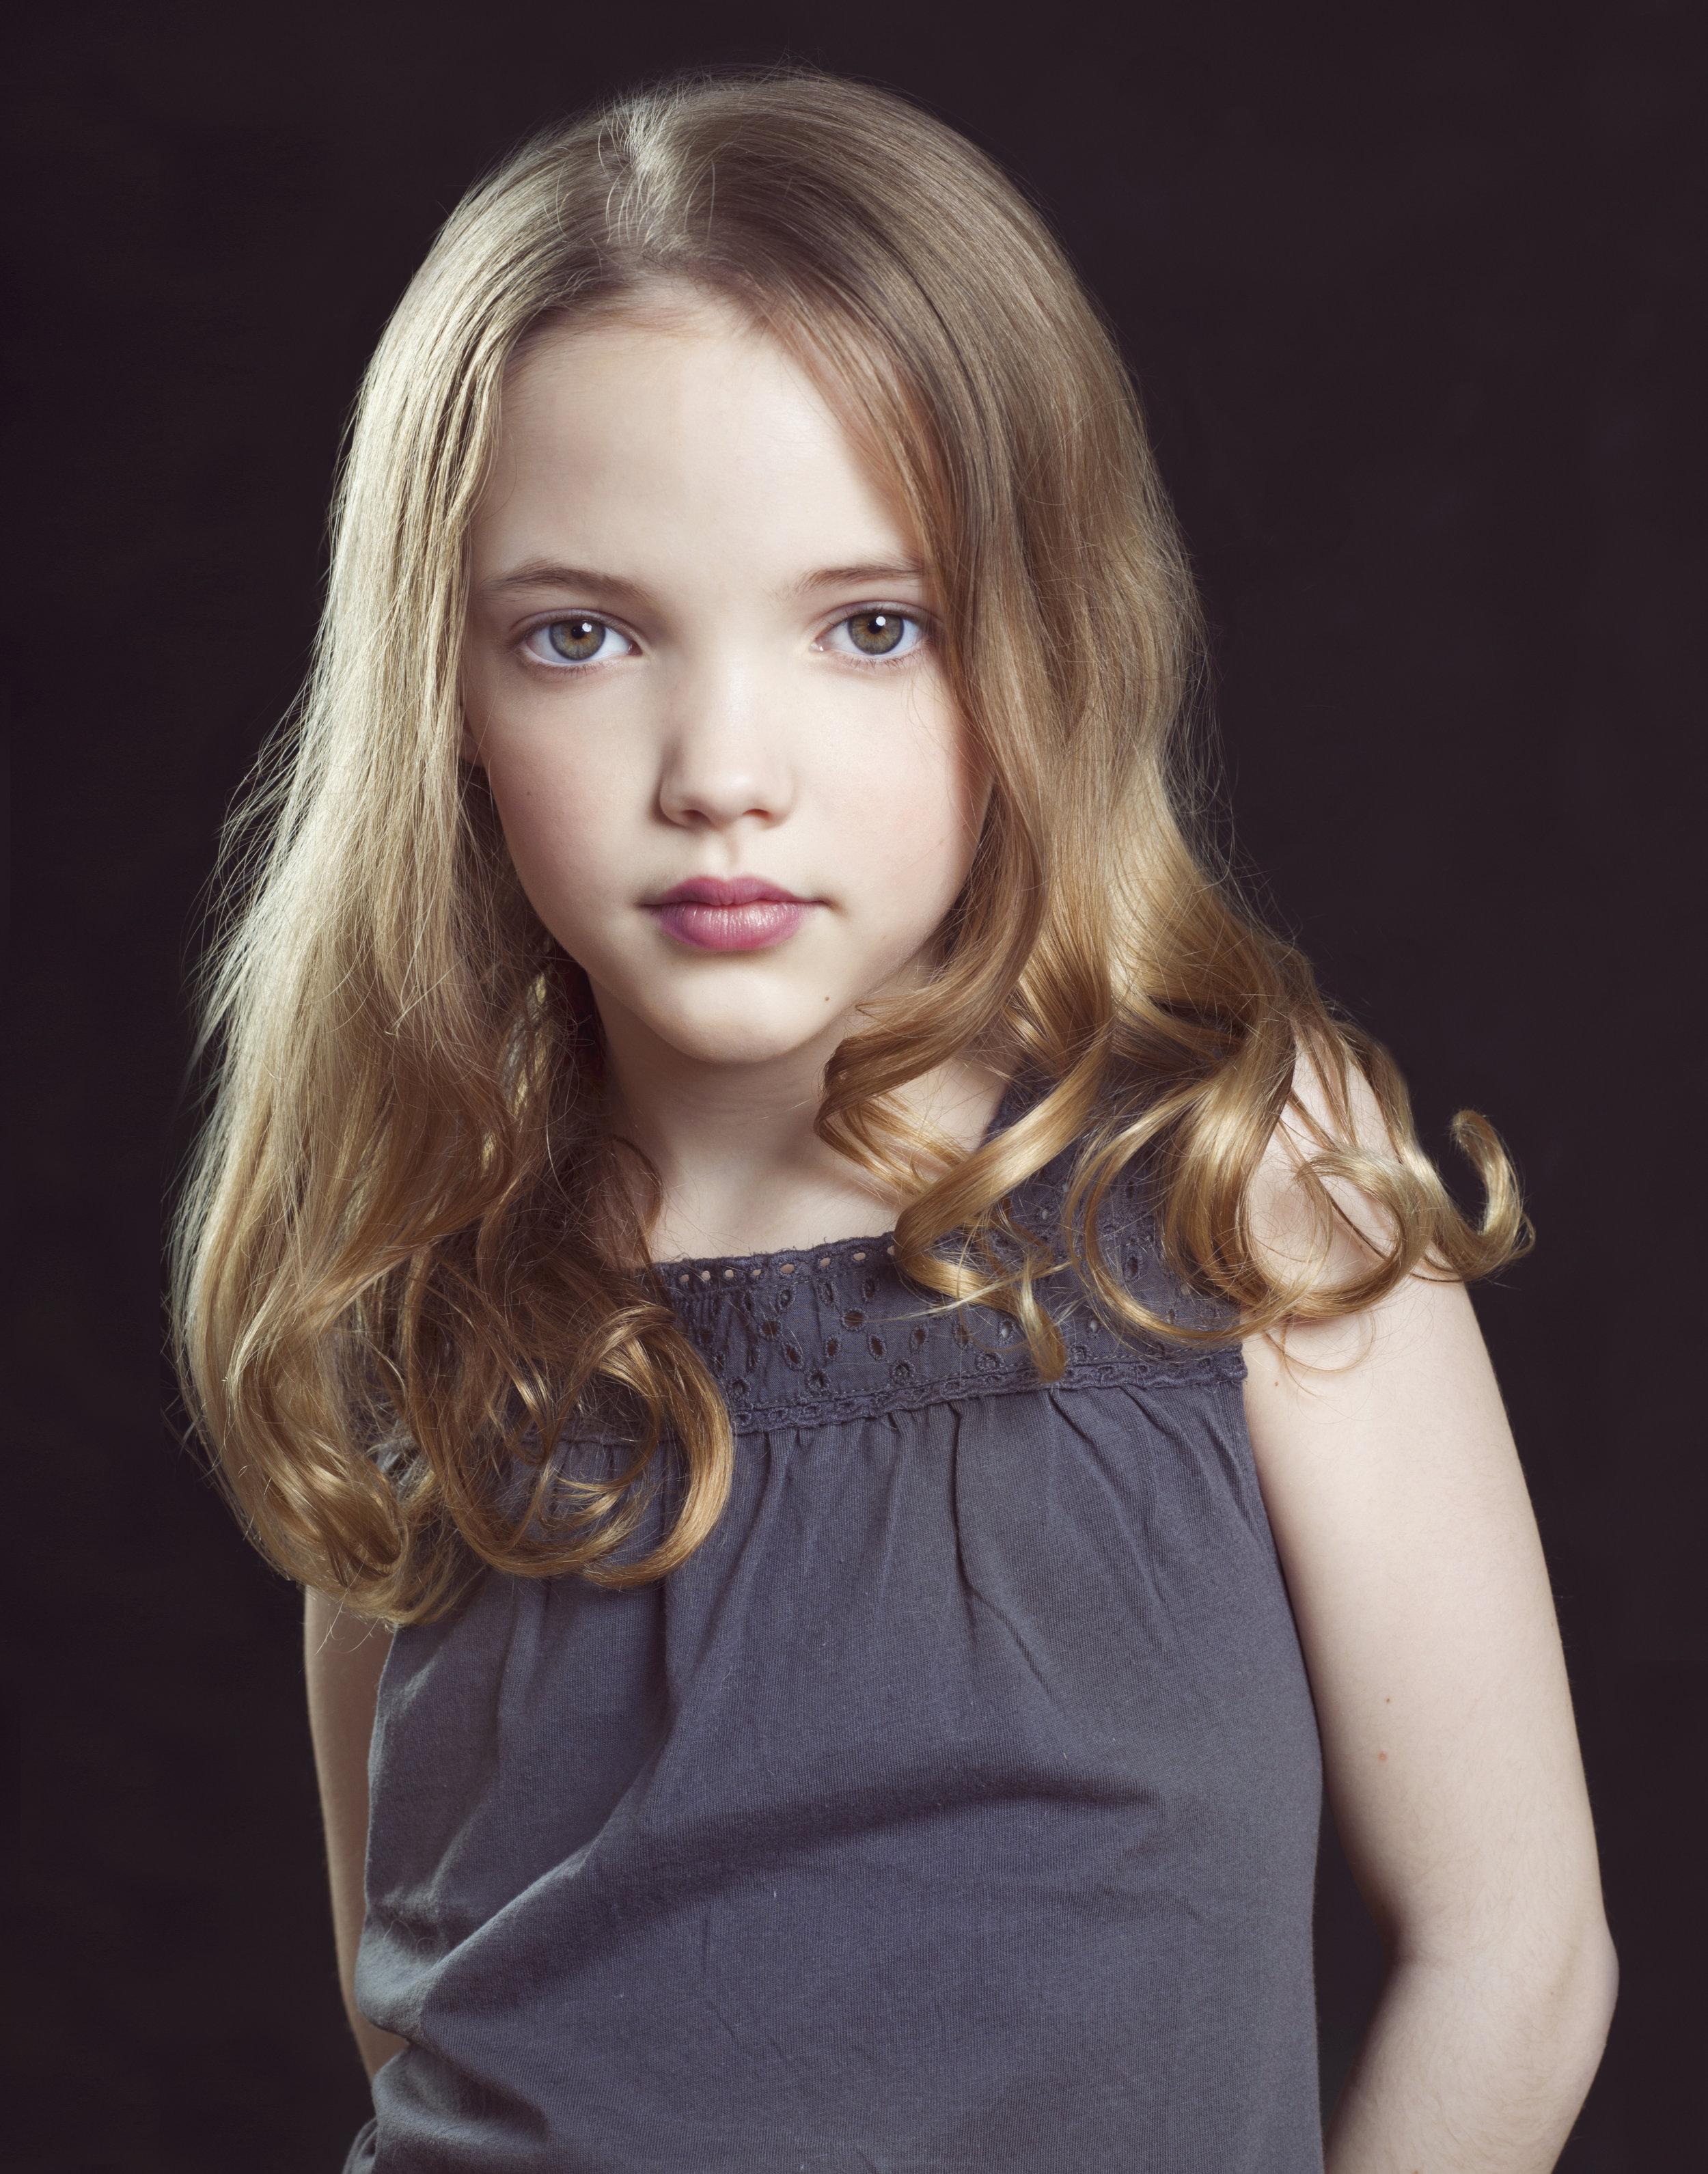 Marta Hewson - Annelise-forbes-little-girl-with-doe-eyes.jpg